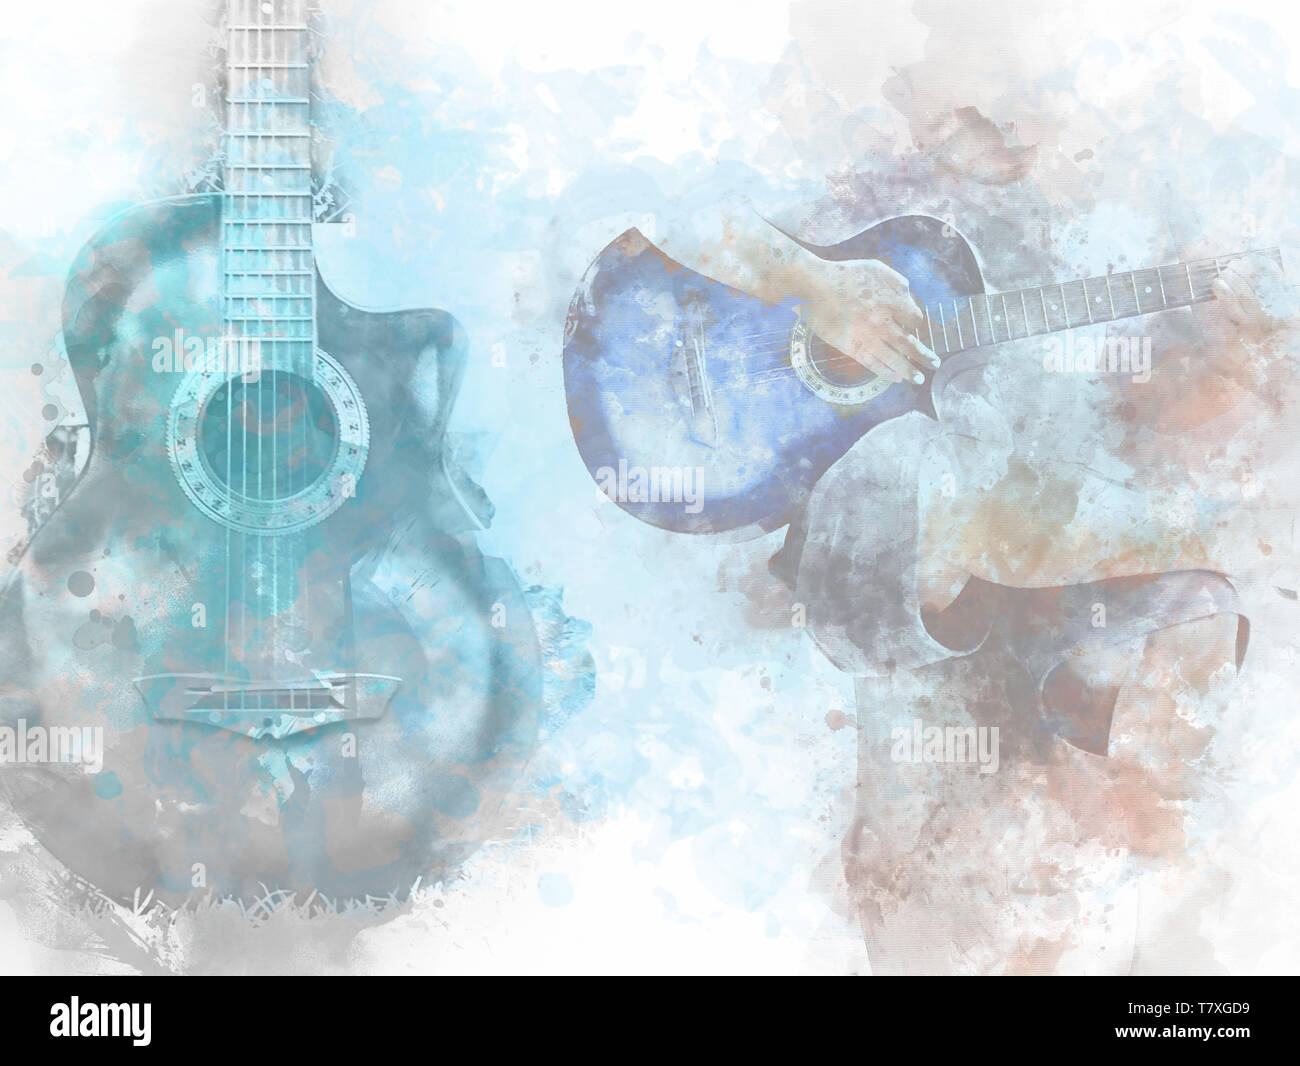 Abstract Acoustics Art